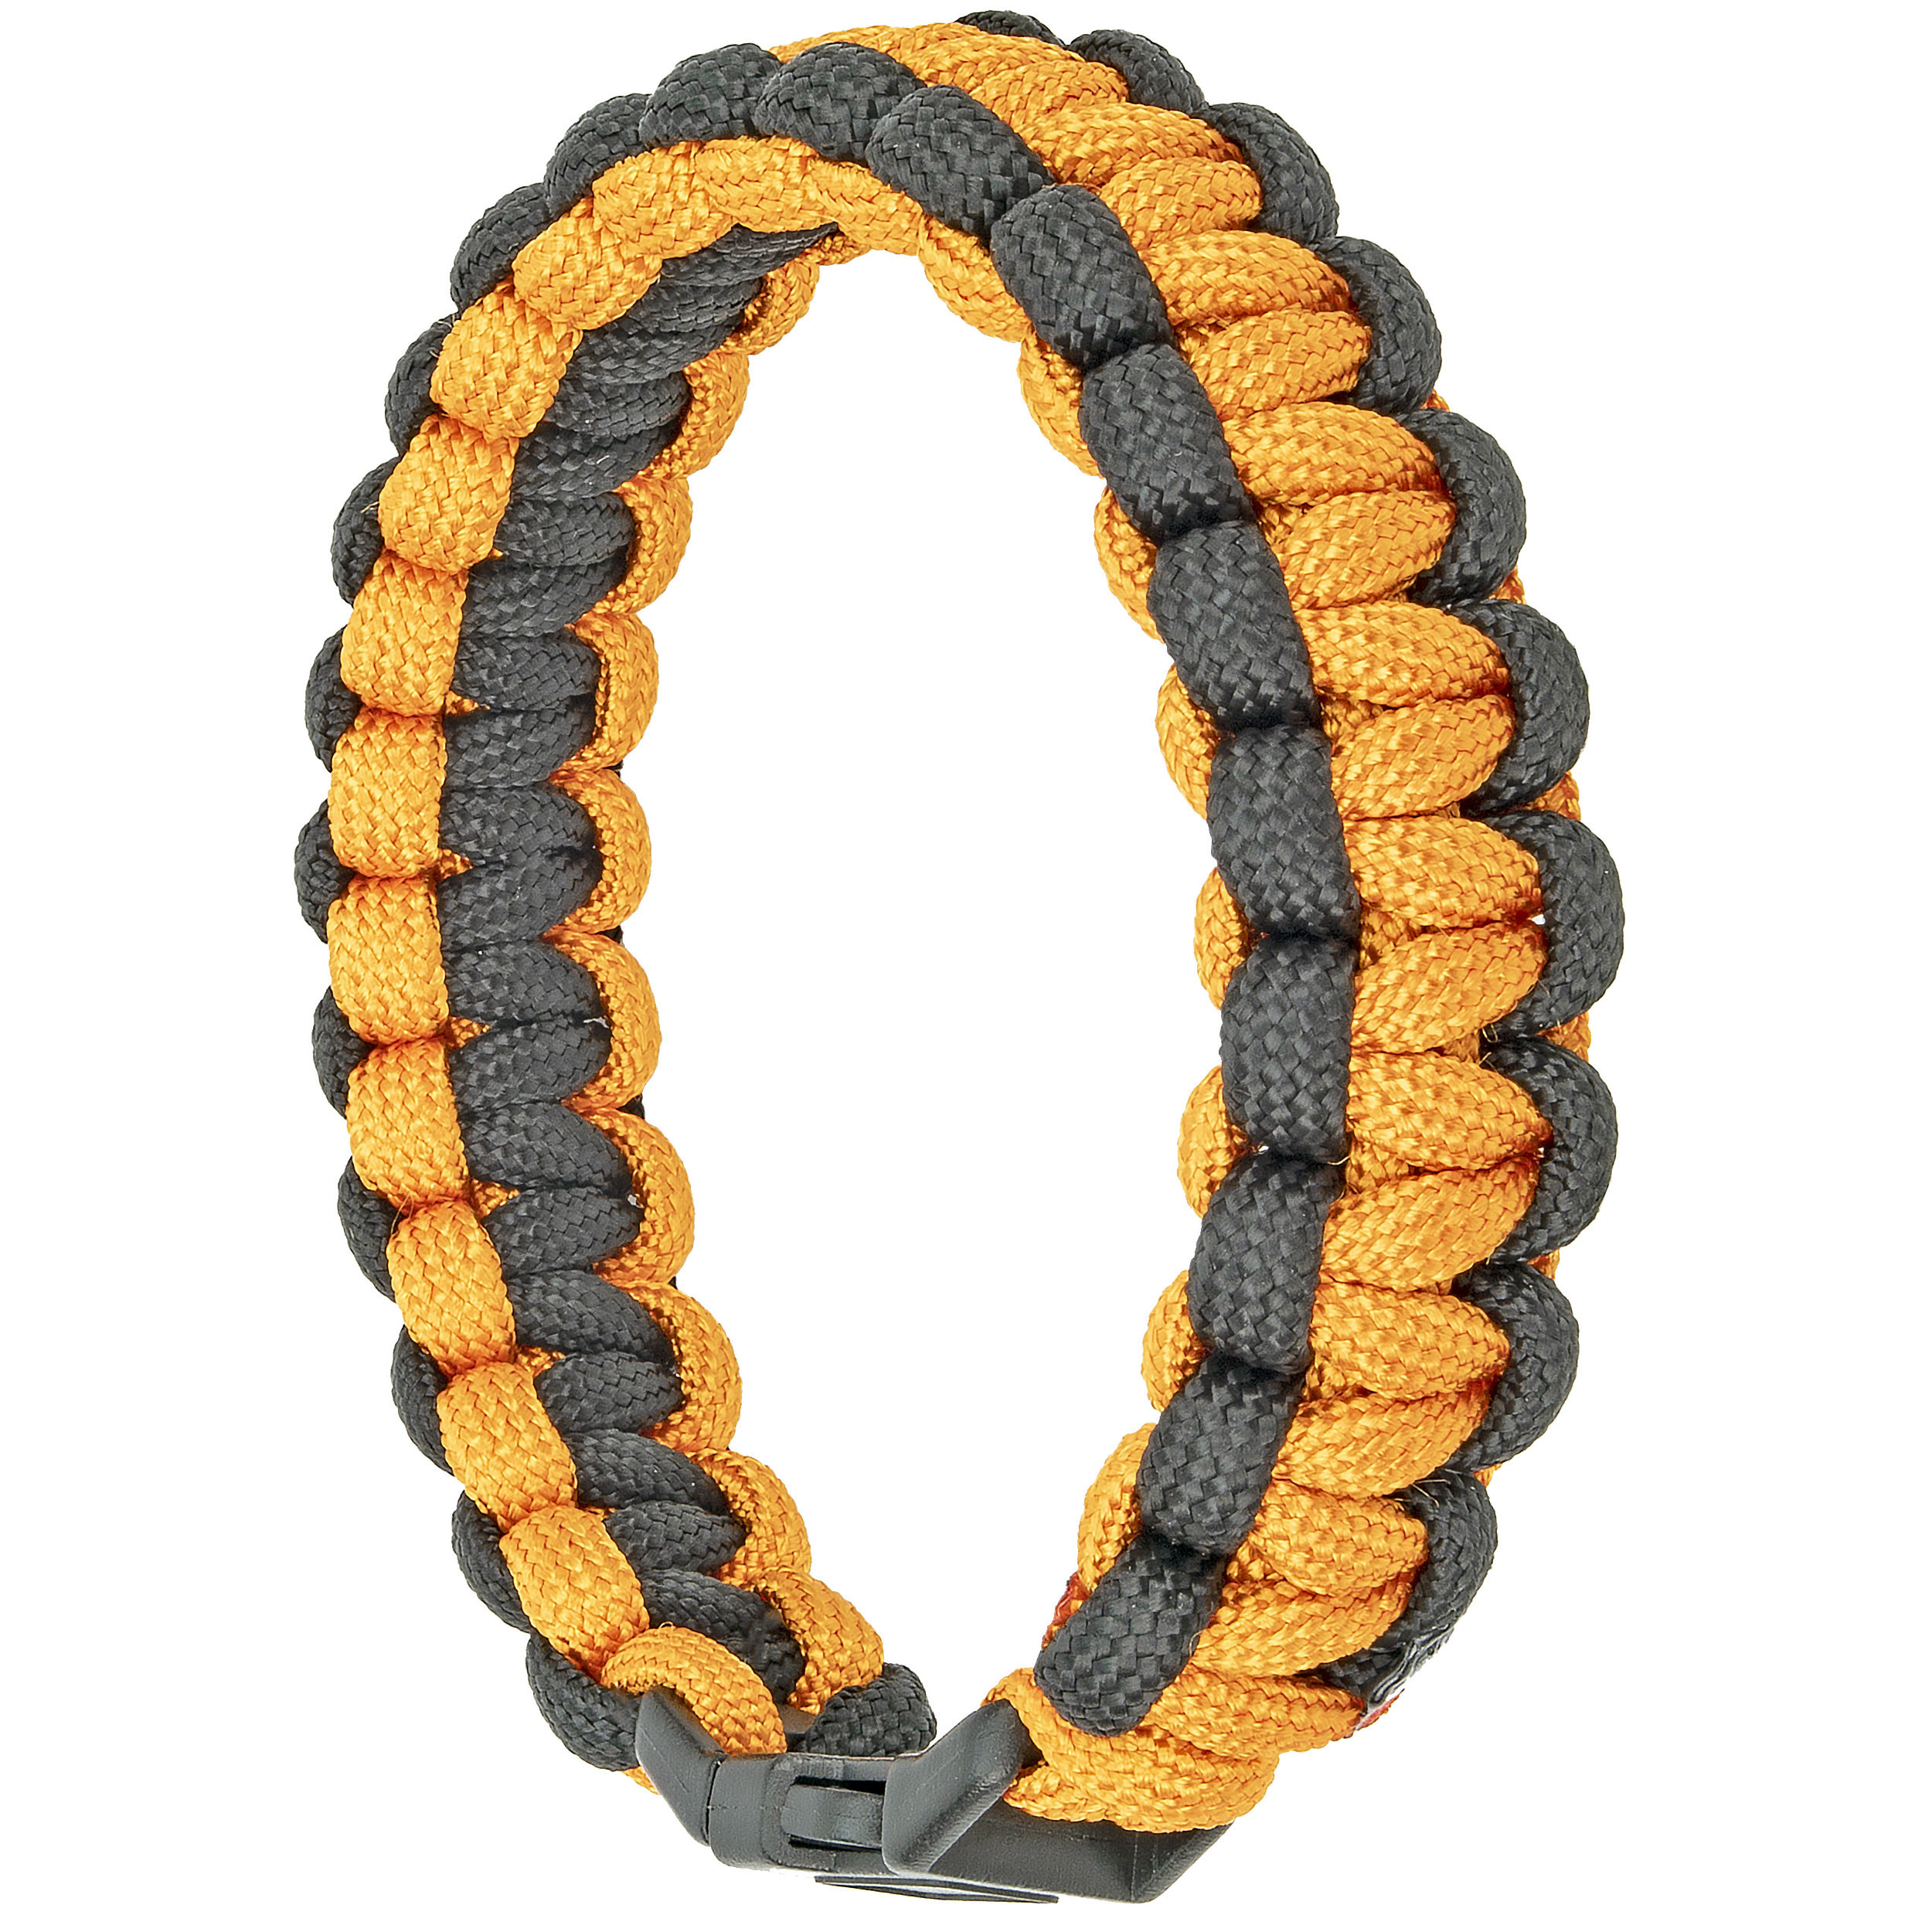 Southern Homewares Paracord Bracelet, 8-Inch, Orange and Black, Purple & Black